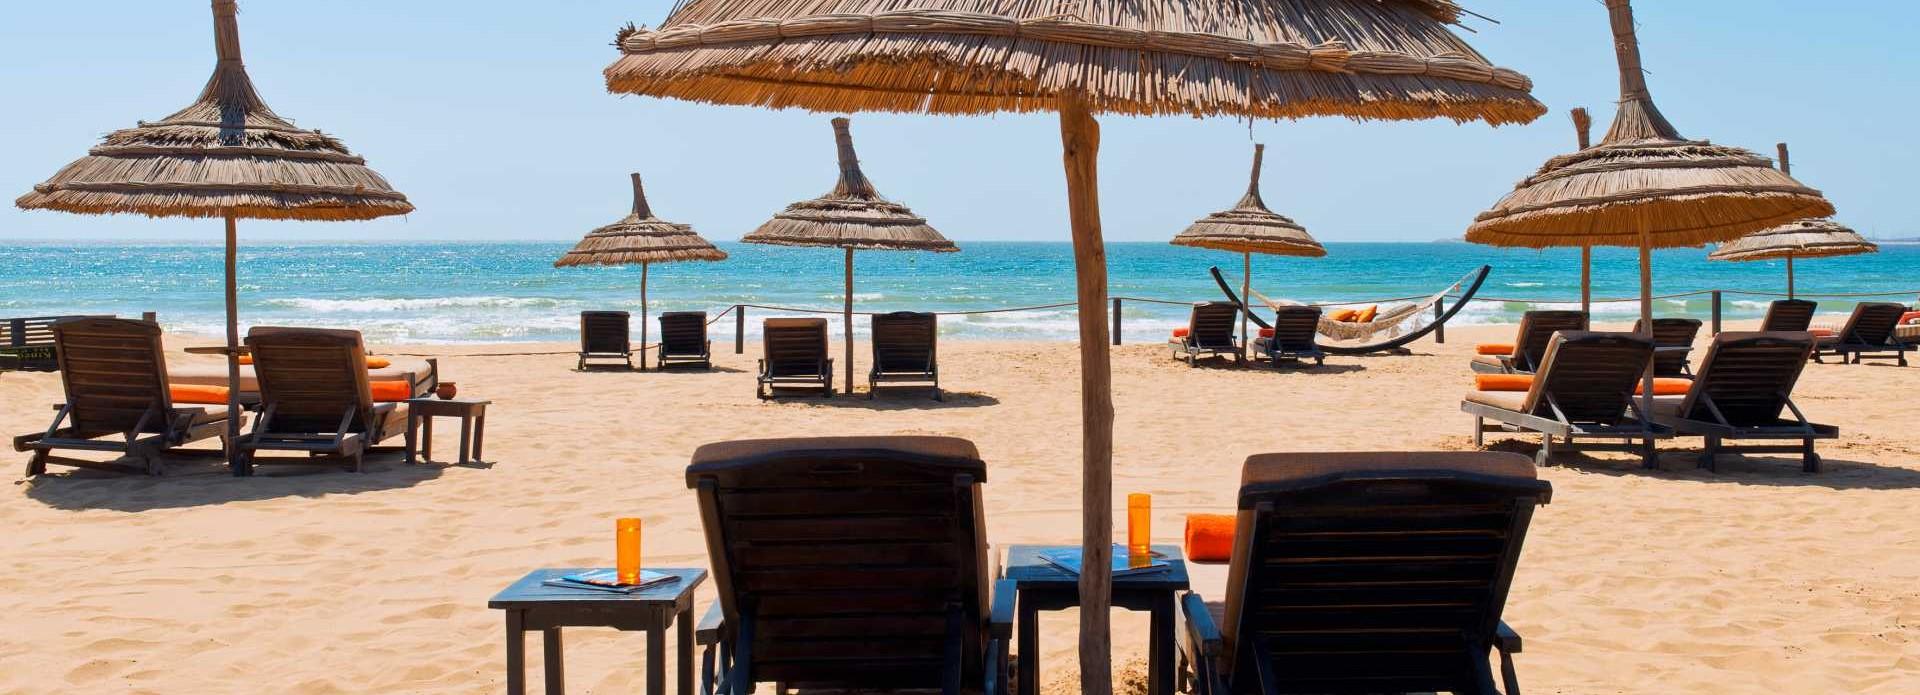 sofitel-agadir-royal-bay-resort-beach